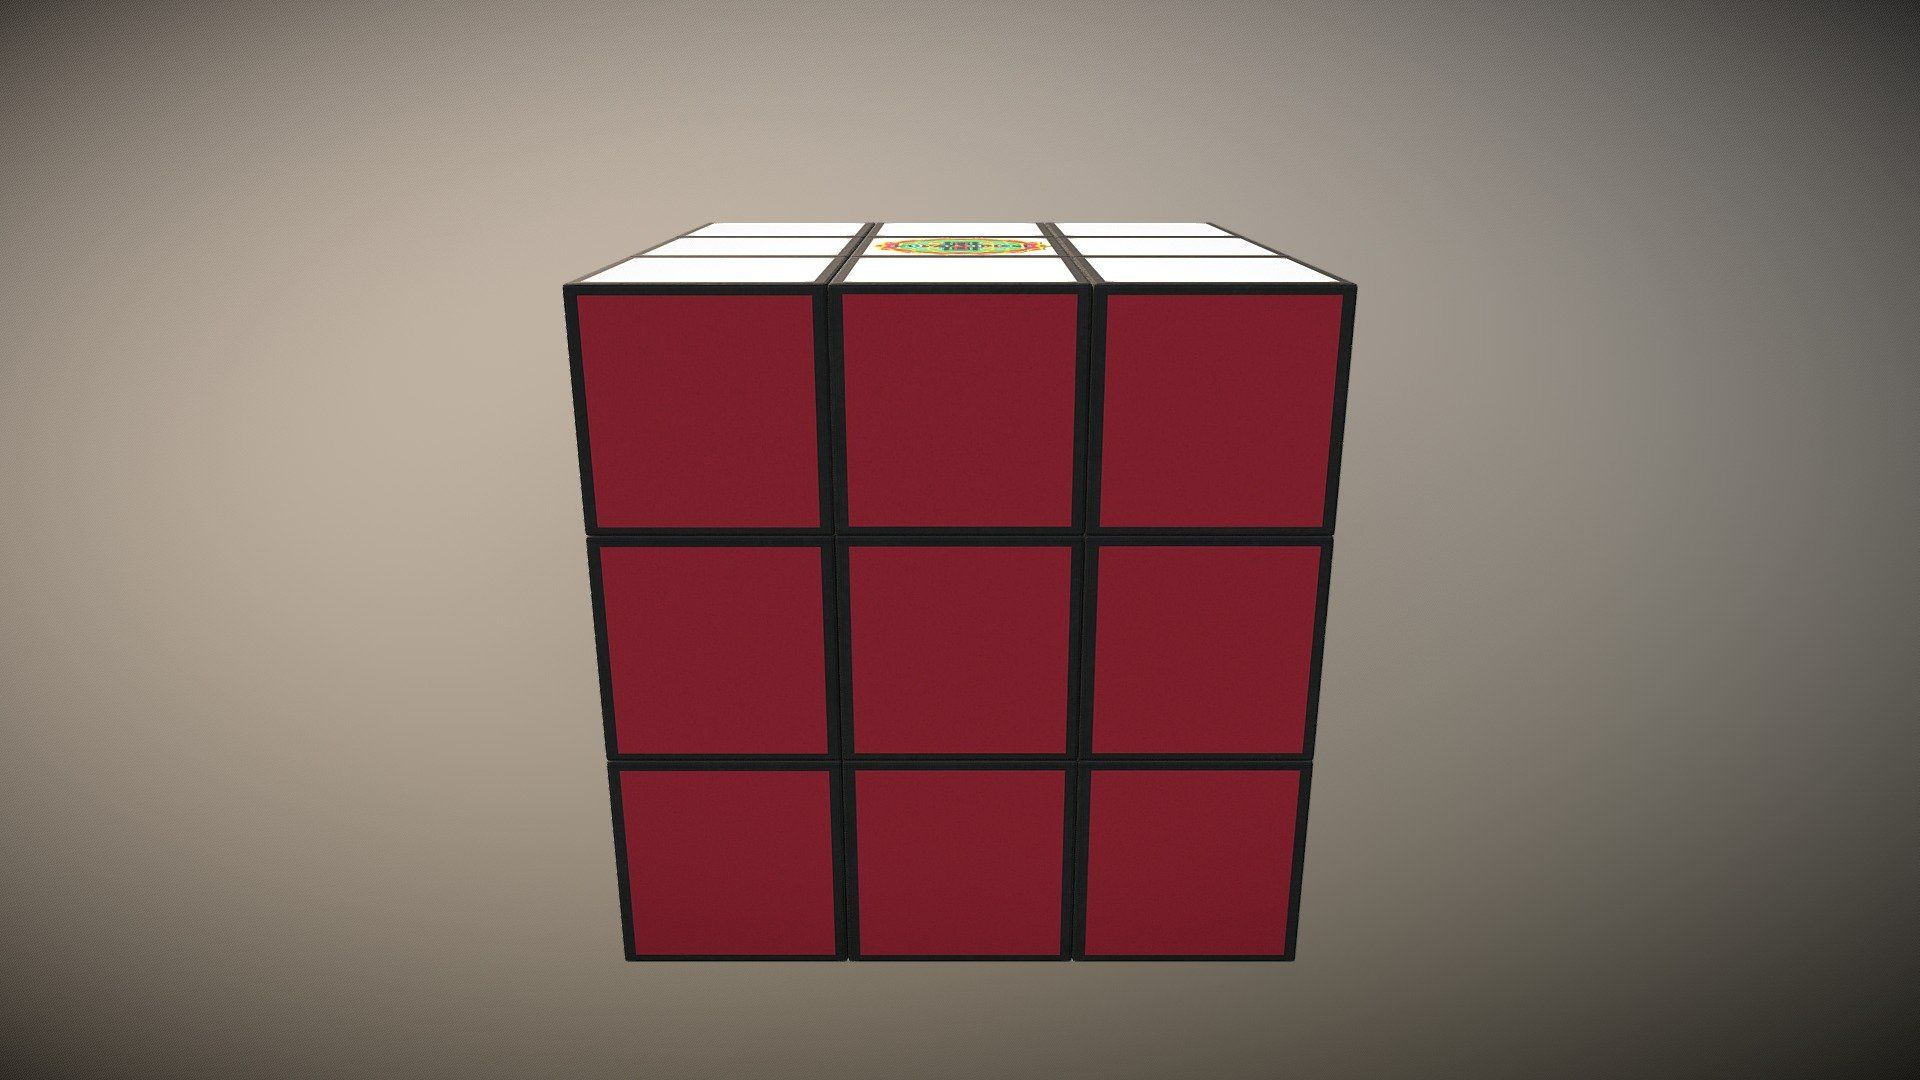 Rubiks Cube desktop wallpaper download